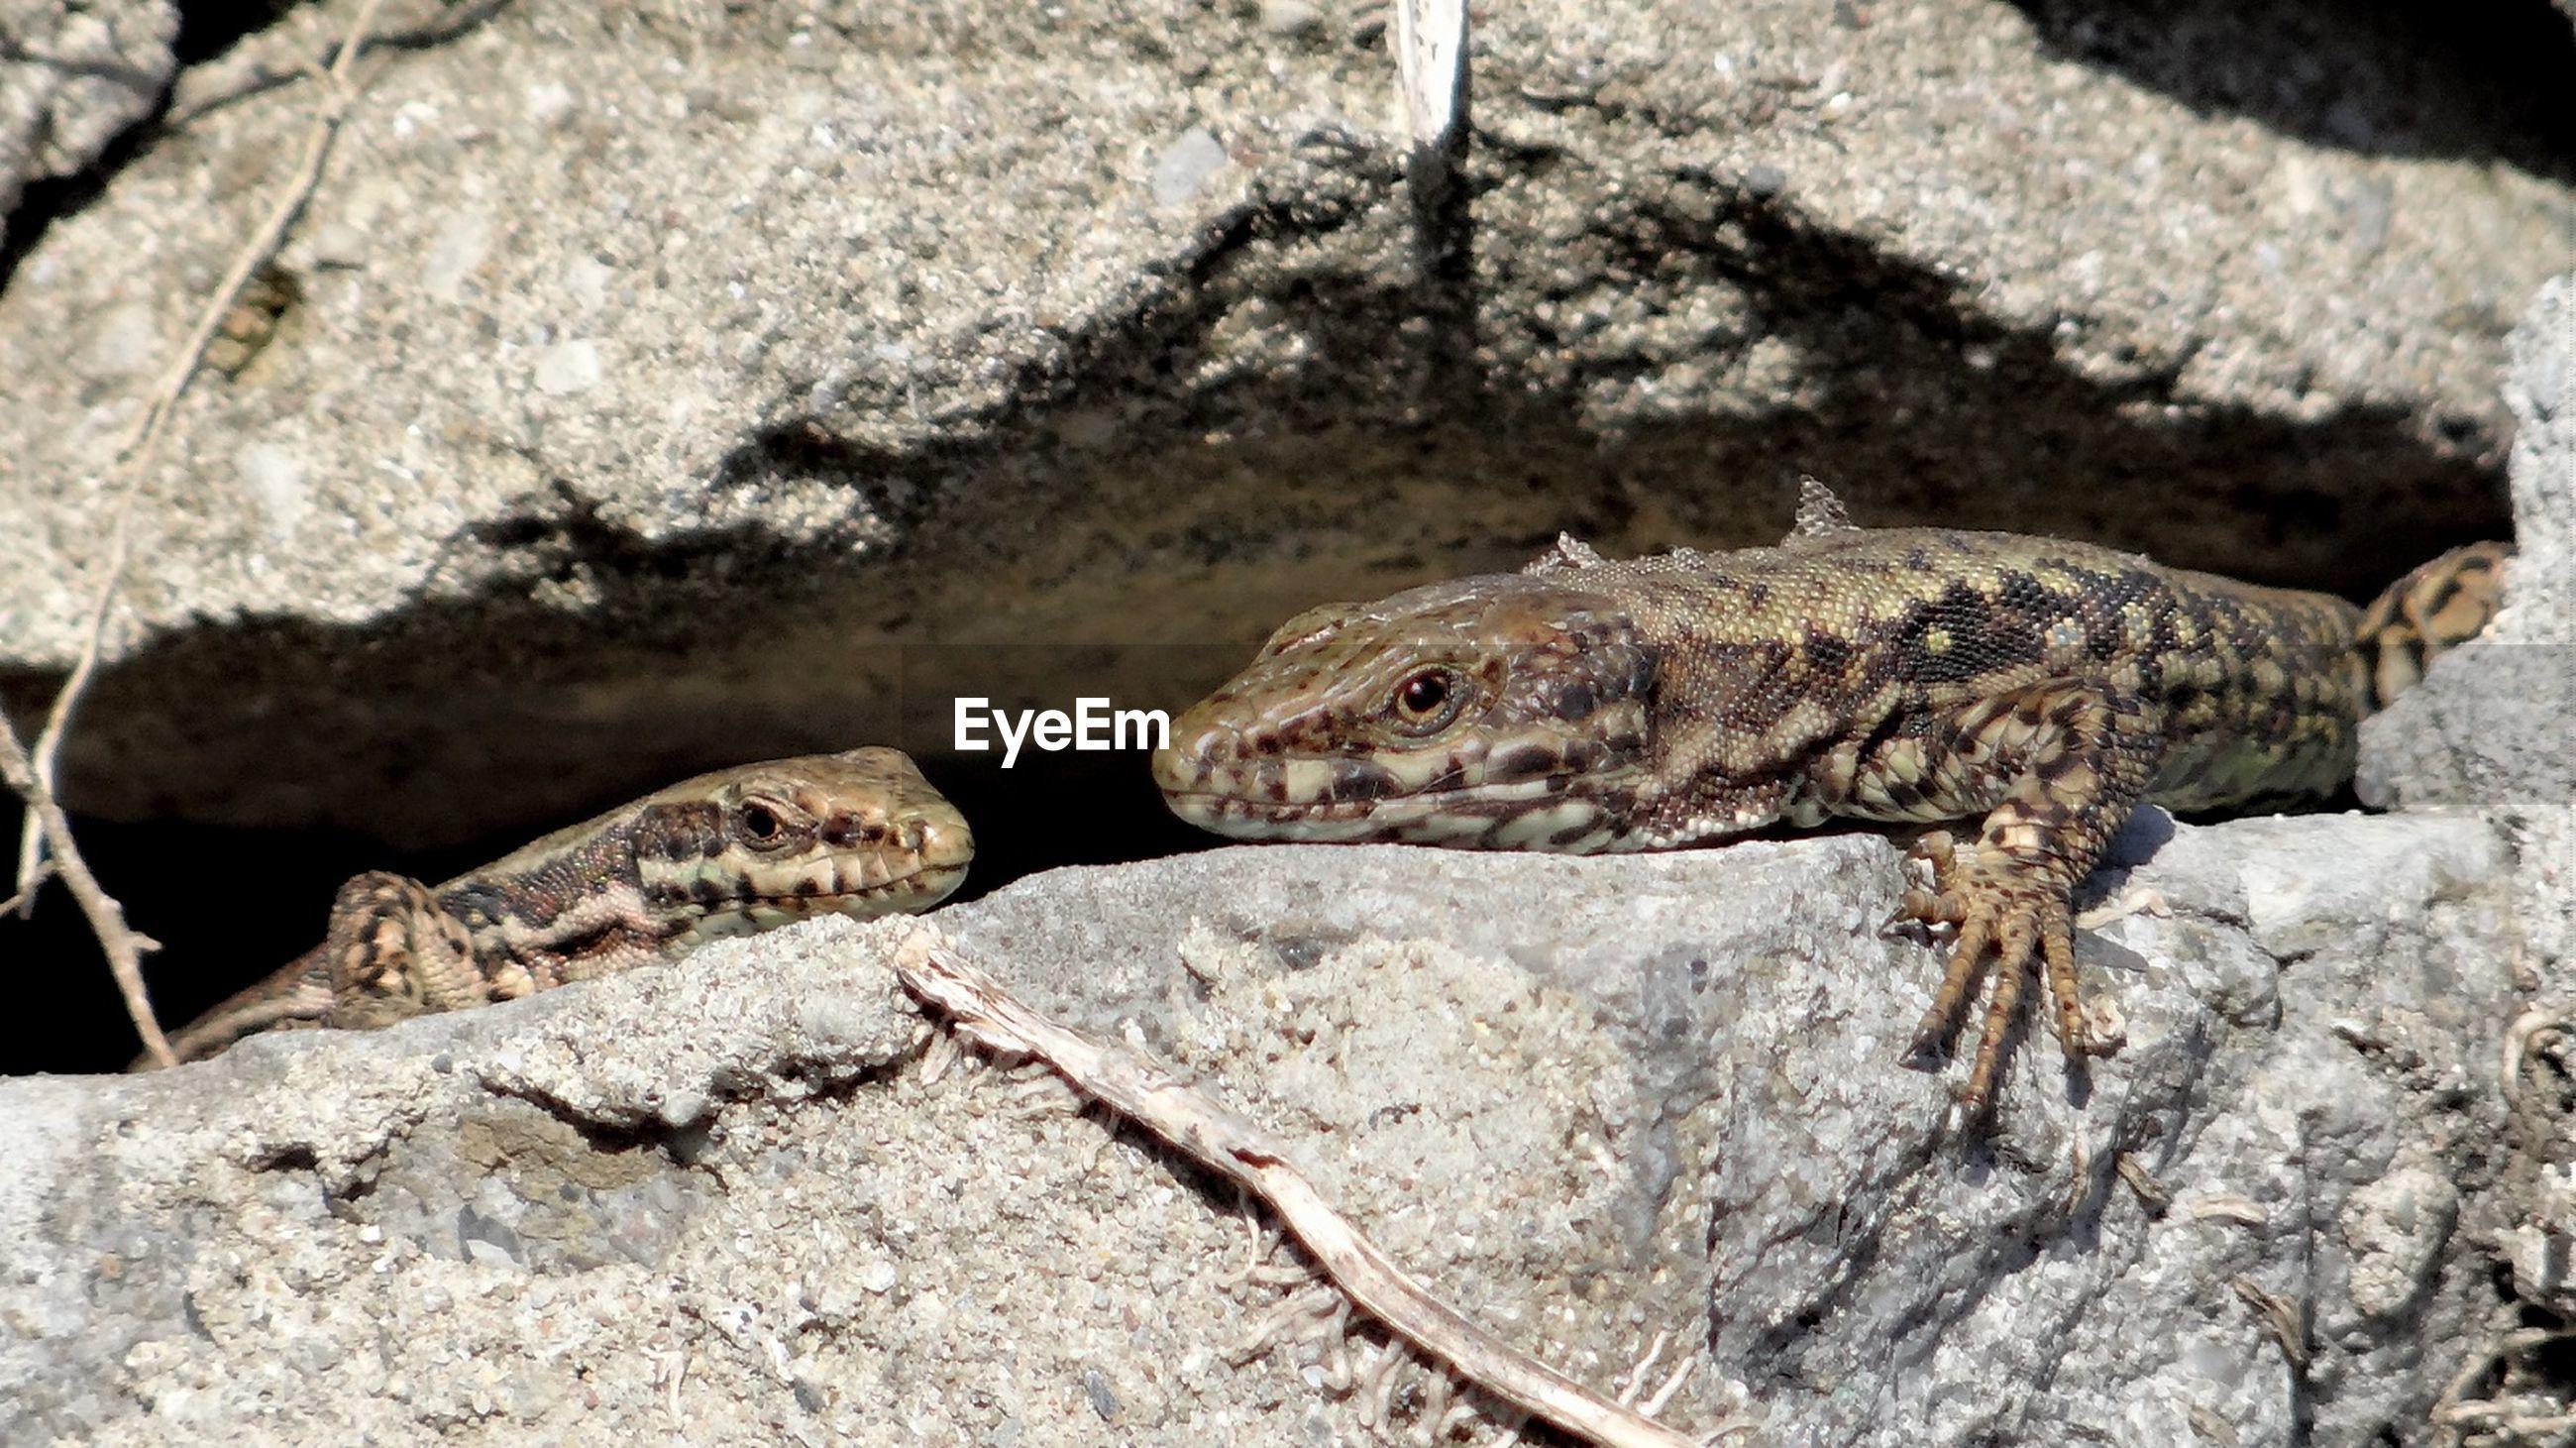 Close-up of lizards on rocks